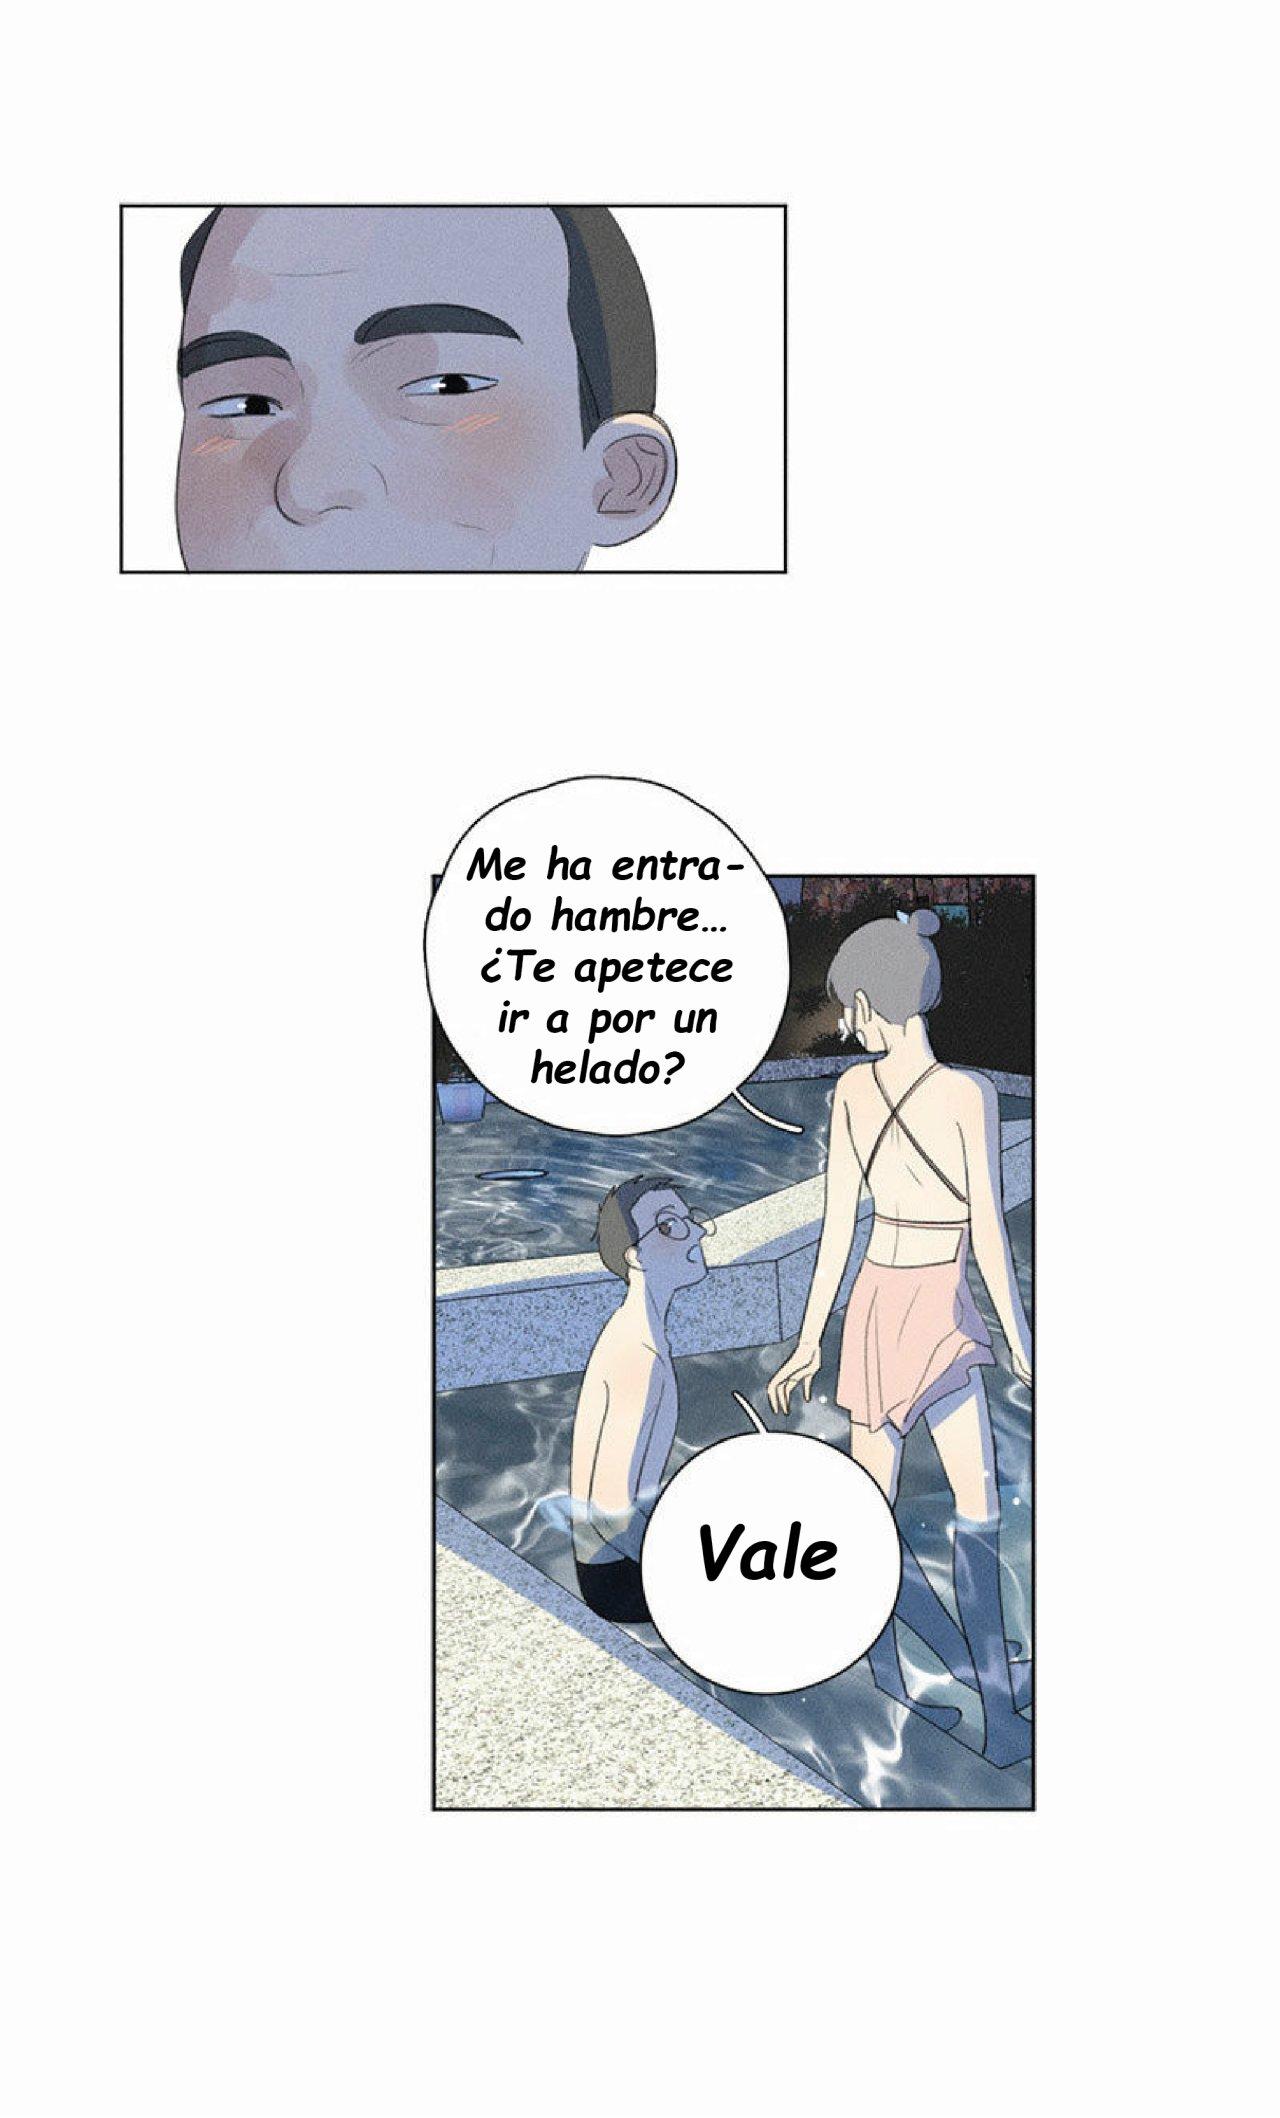 https://nine.mangadogs.com/es_manga/pic8/29/24925/946329/f0d57d9cd49edd665cdaf8317ba43b80.jpg Page 7